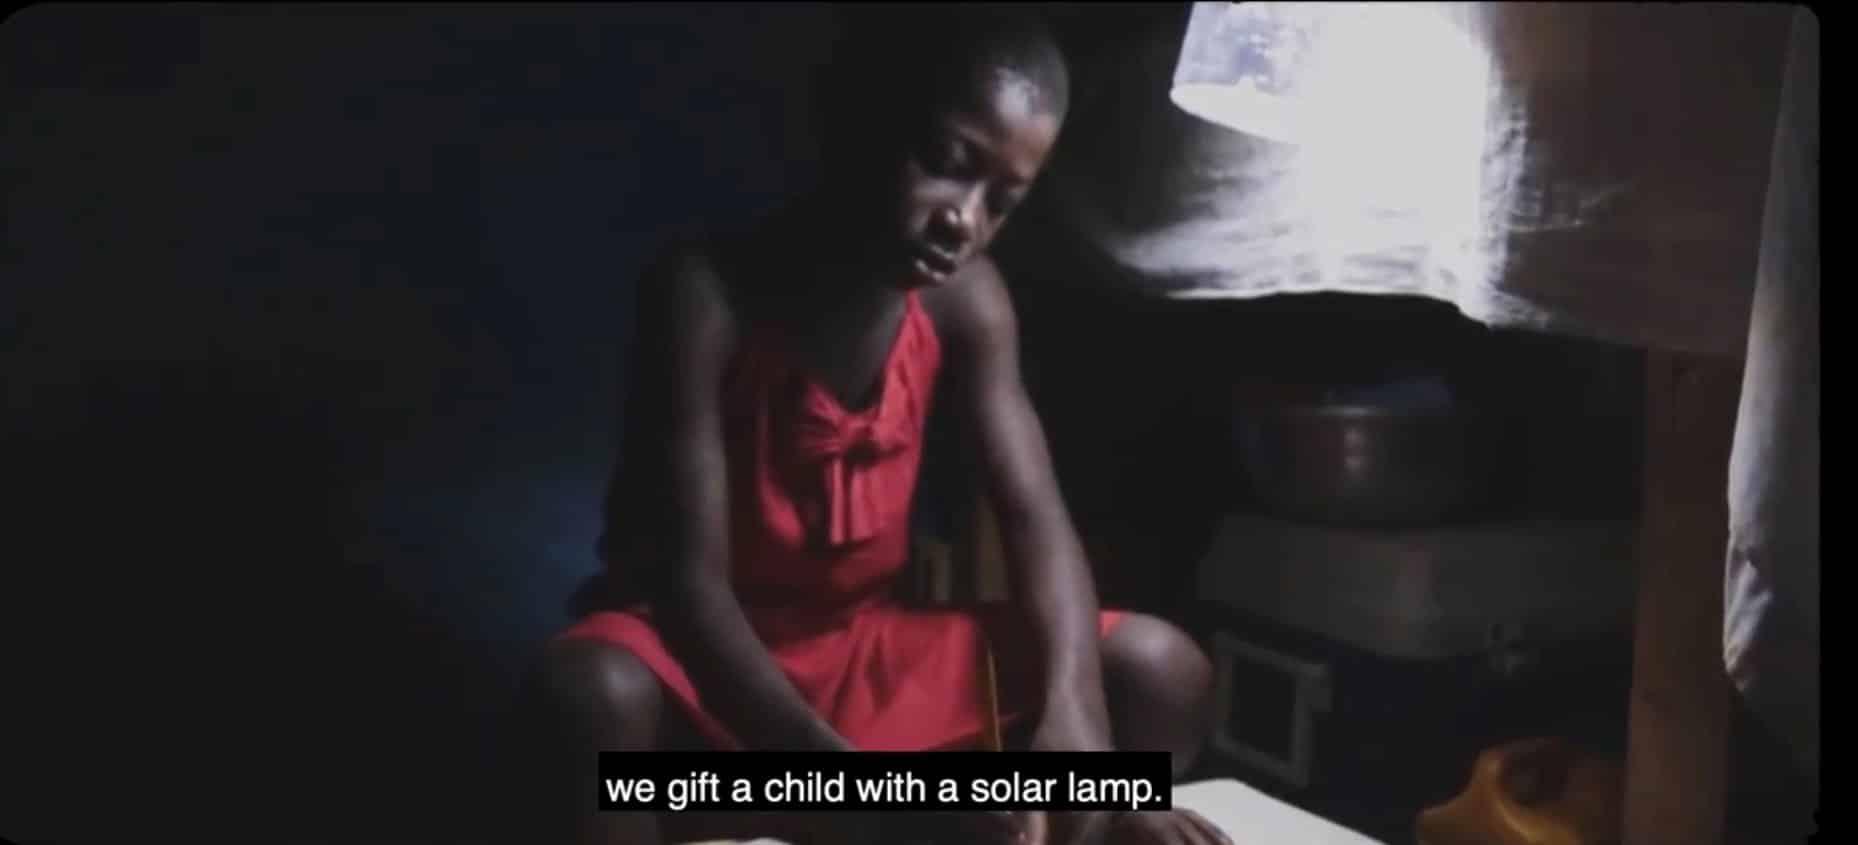 Child solar lamp re dress